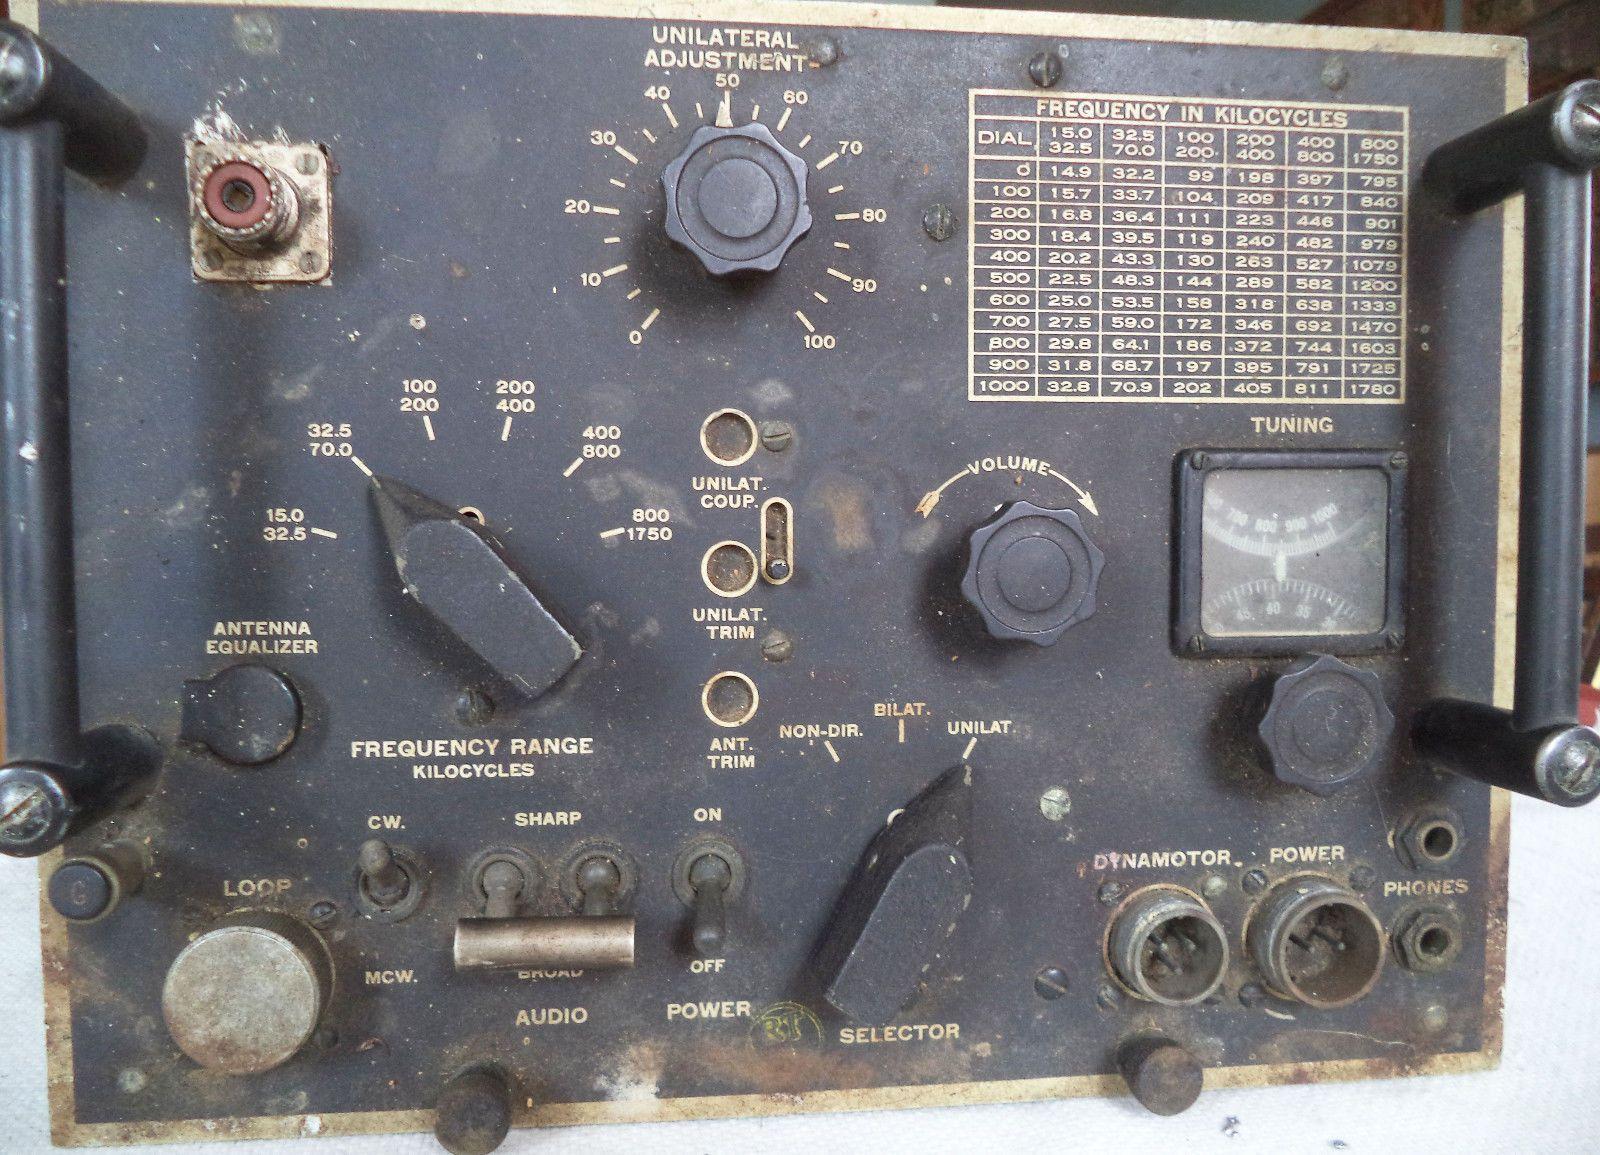 Navbuships receiver model crv46152 for aircraft ham